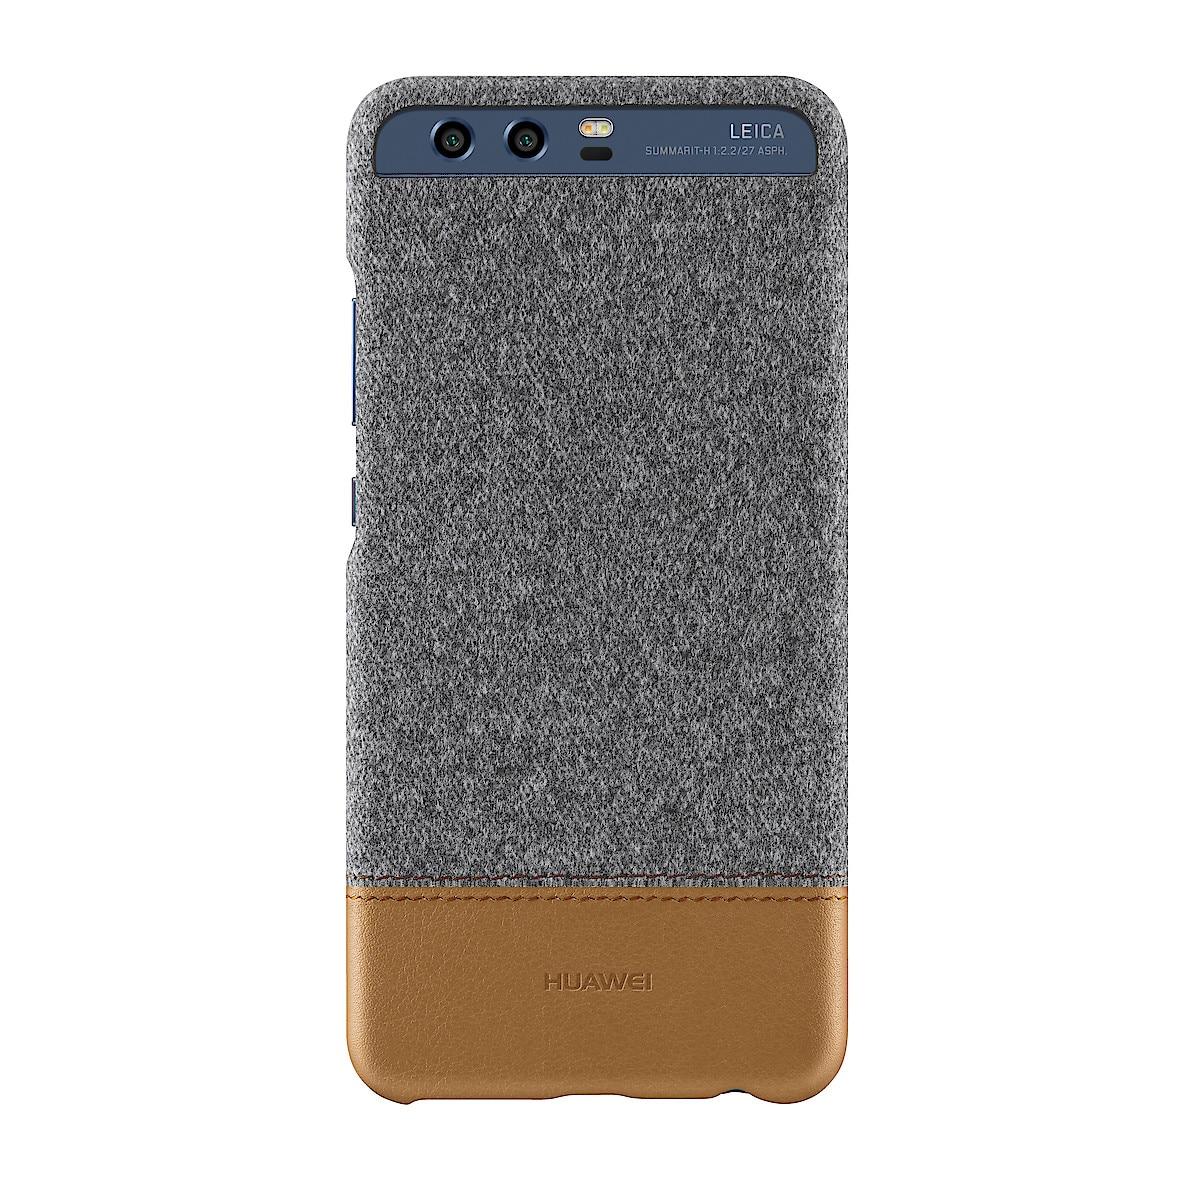 Mobilskal Mashup för Huawei P10